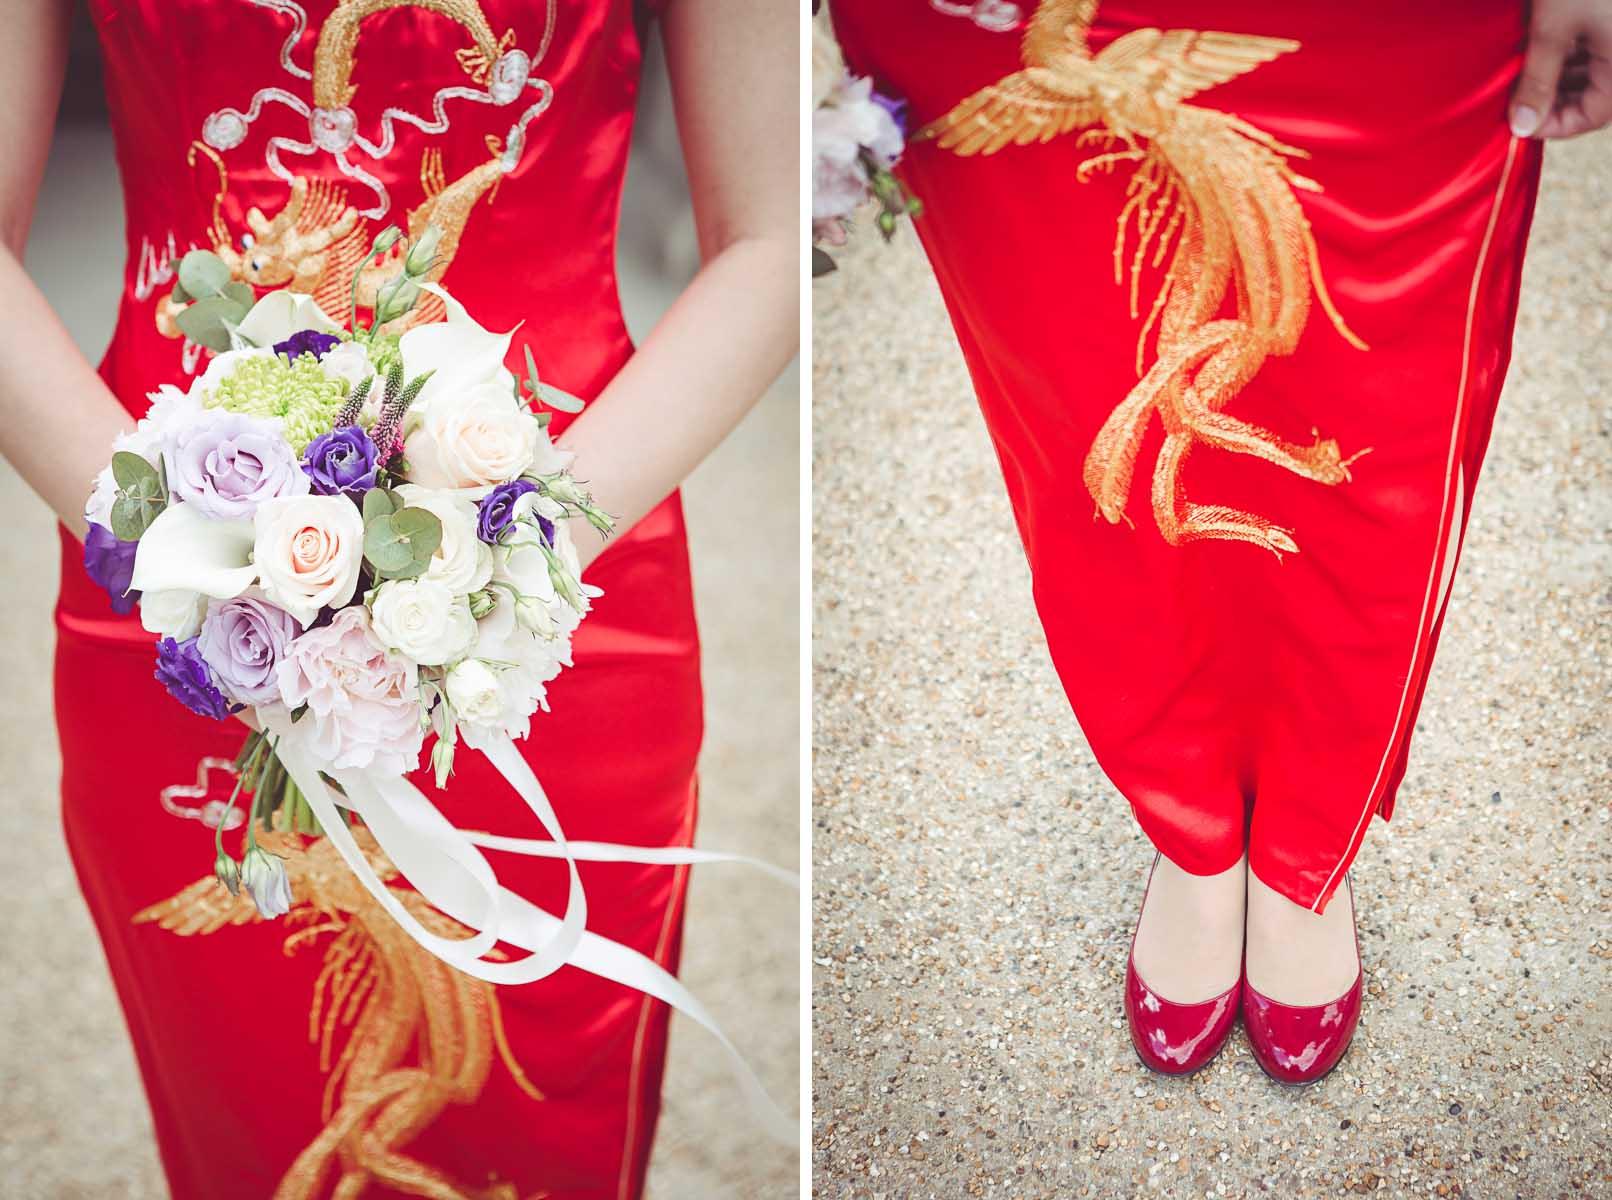 Silk red chinese wedding dress